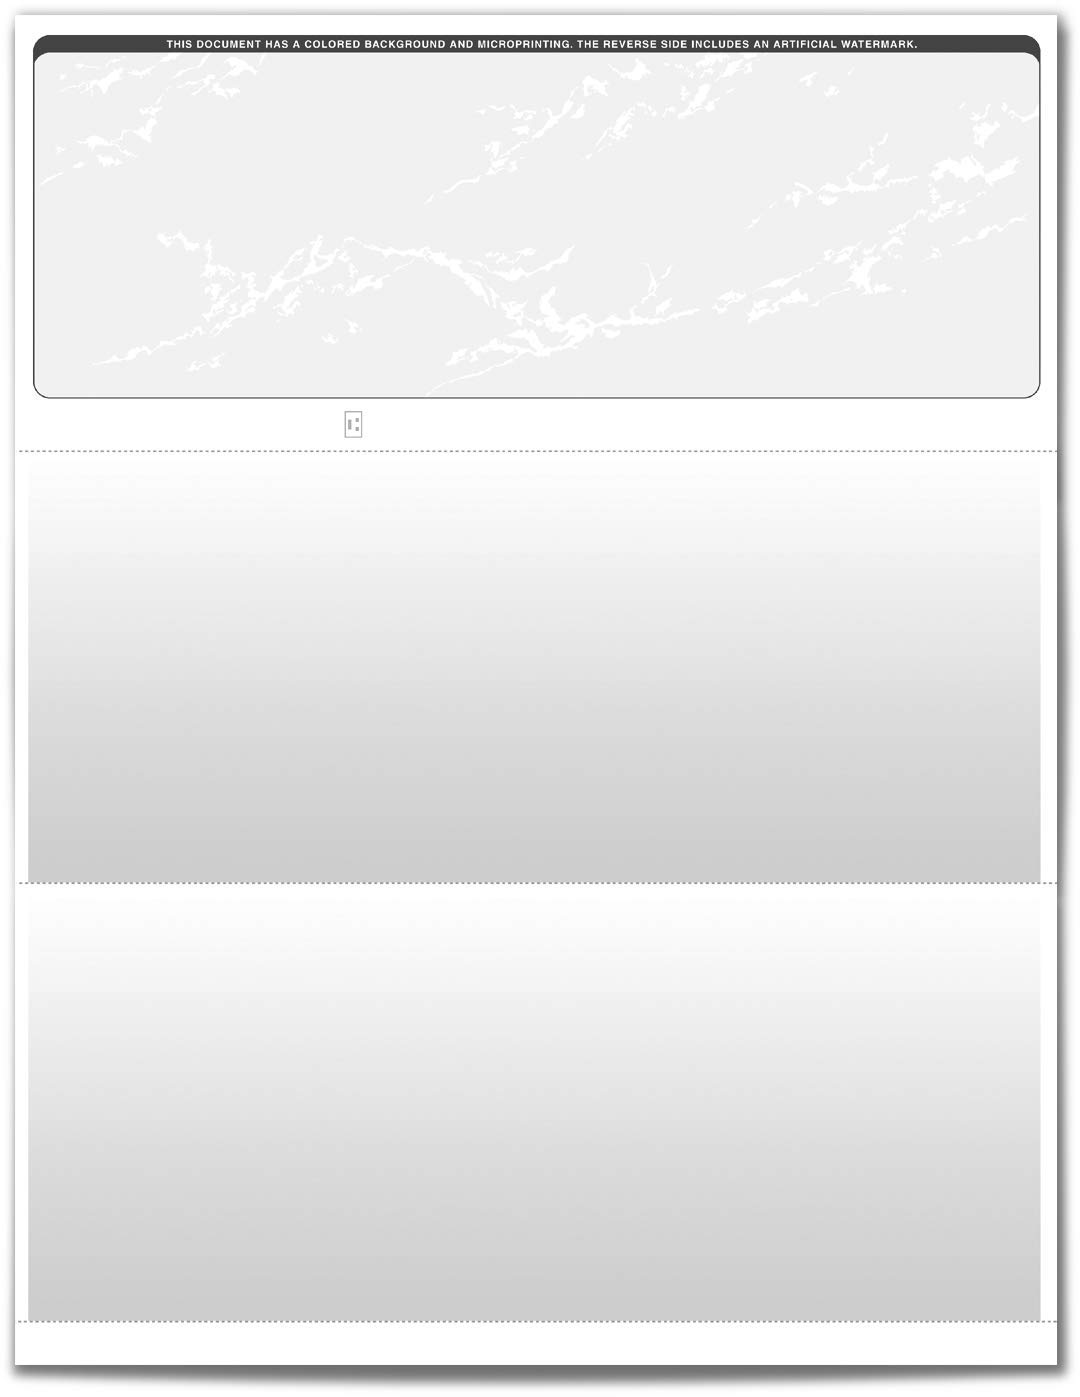 VersaCheck ValueChex Blank Check Paper - Form #1000 Business Voucher Check on Top - Grey - Prestige - 5000 Sheets/5000 Checks